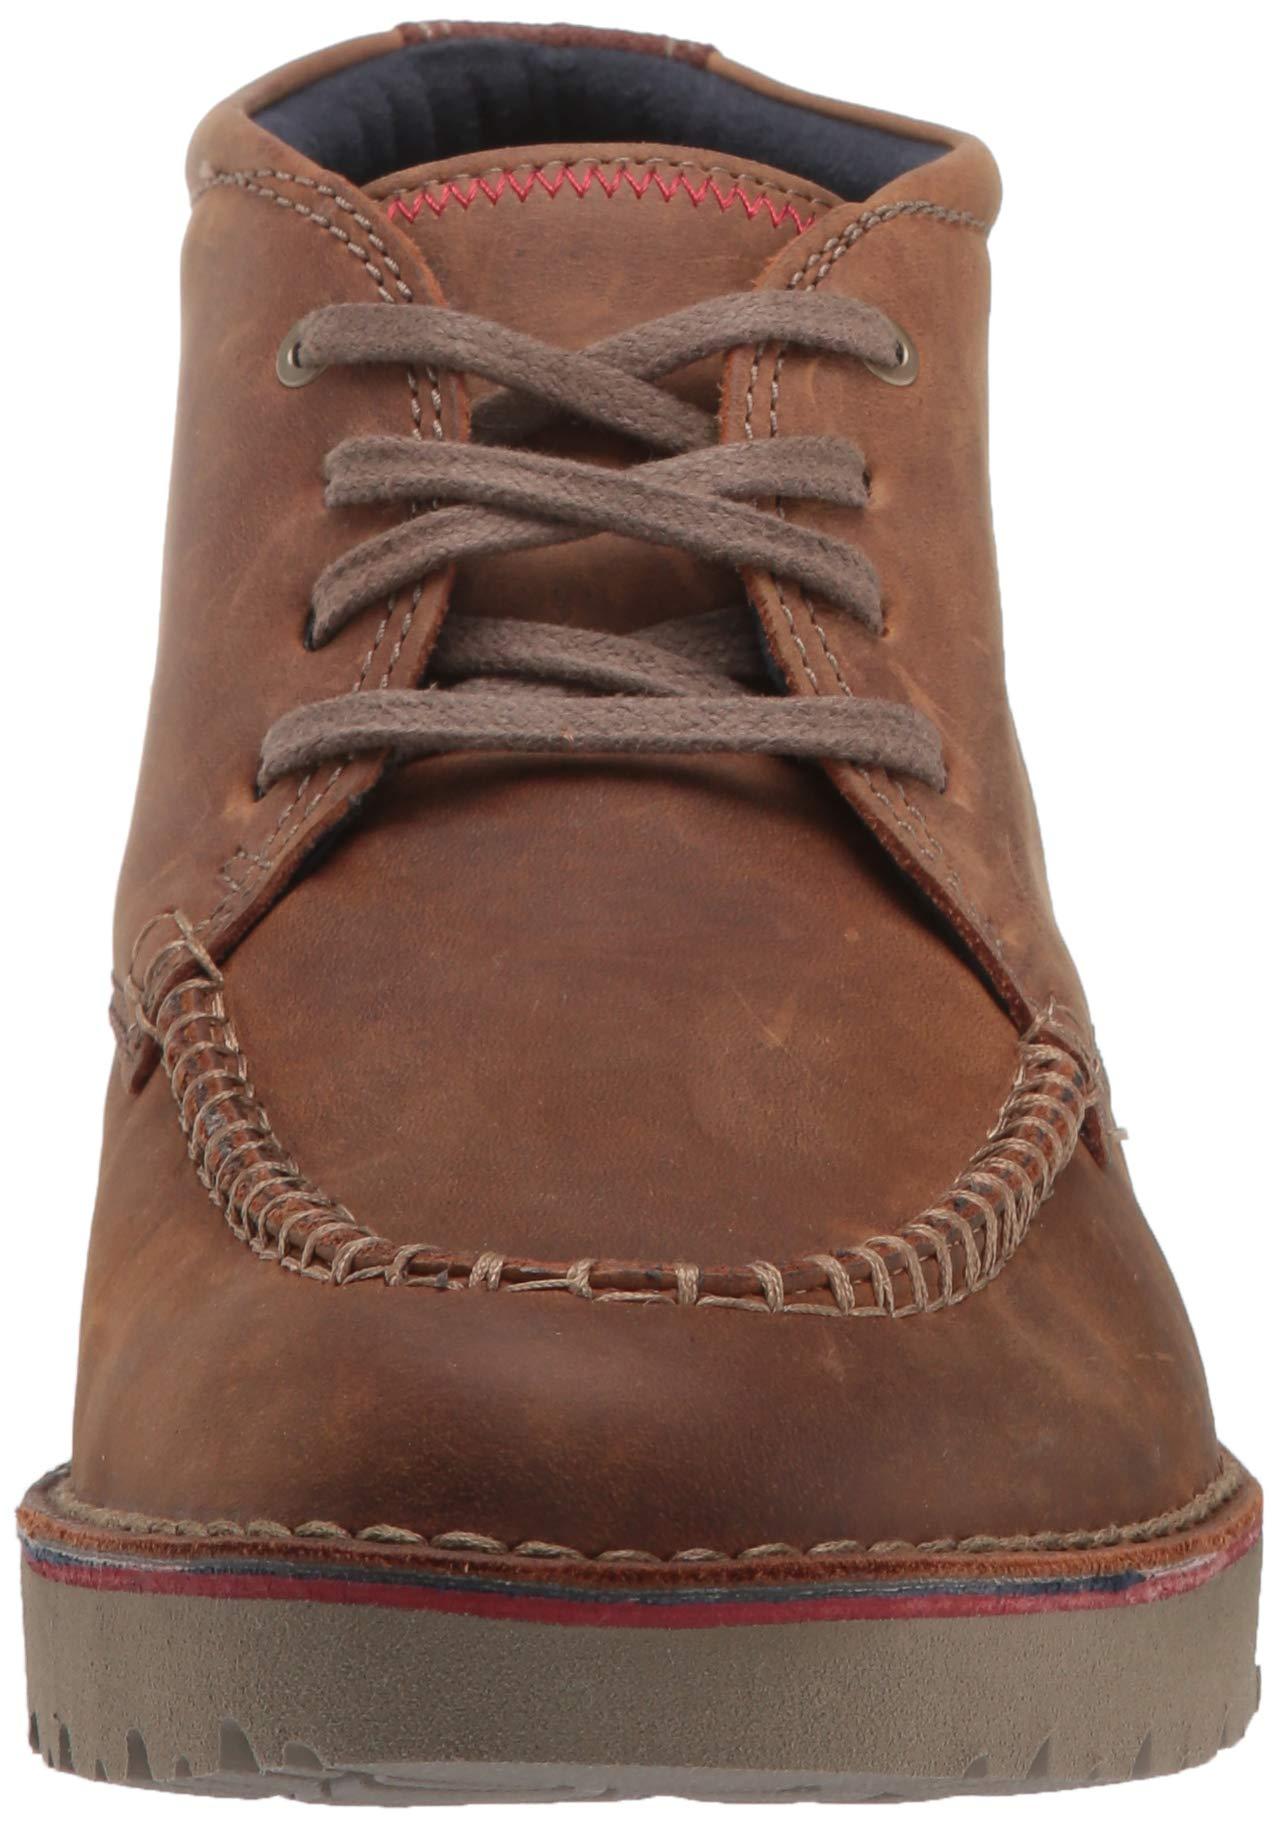 Clarks Men's Vargo Apron Ankle Boot 4